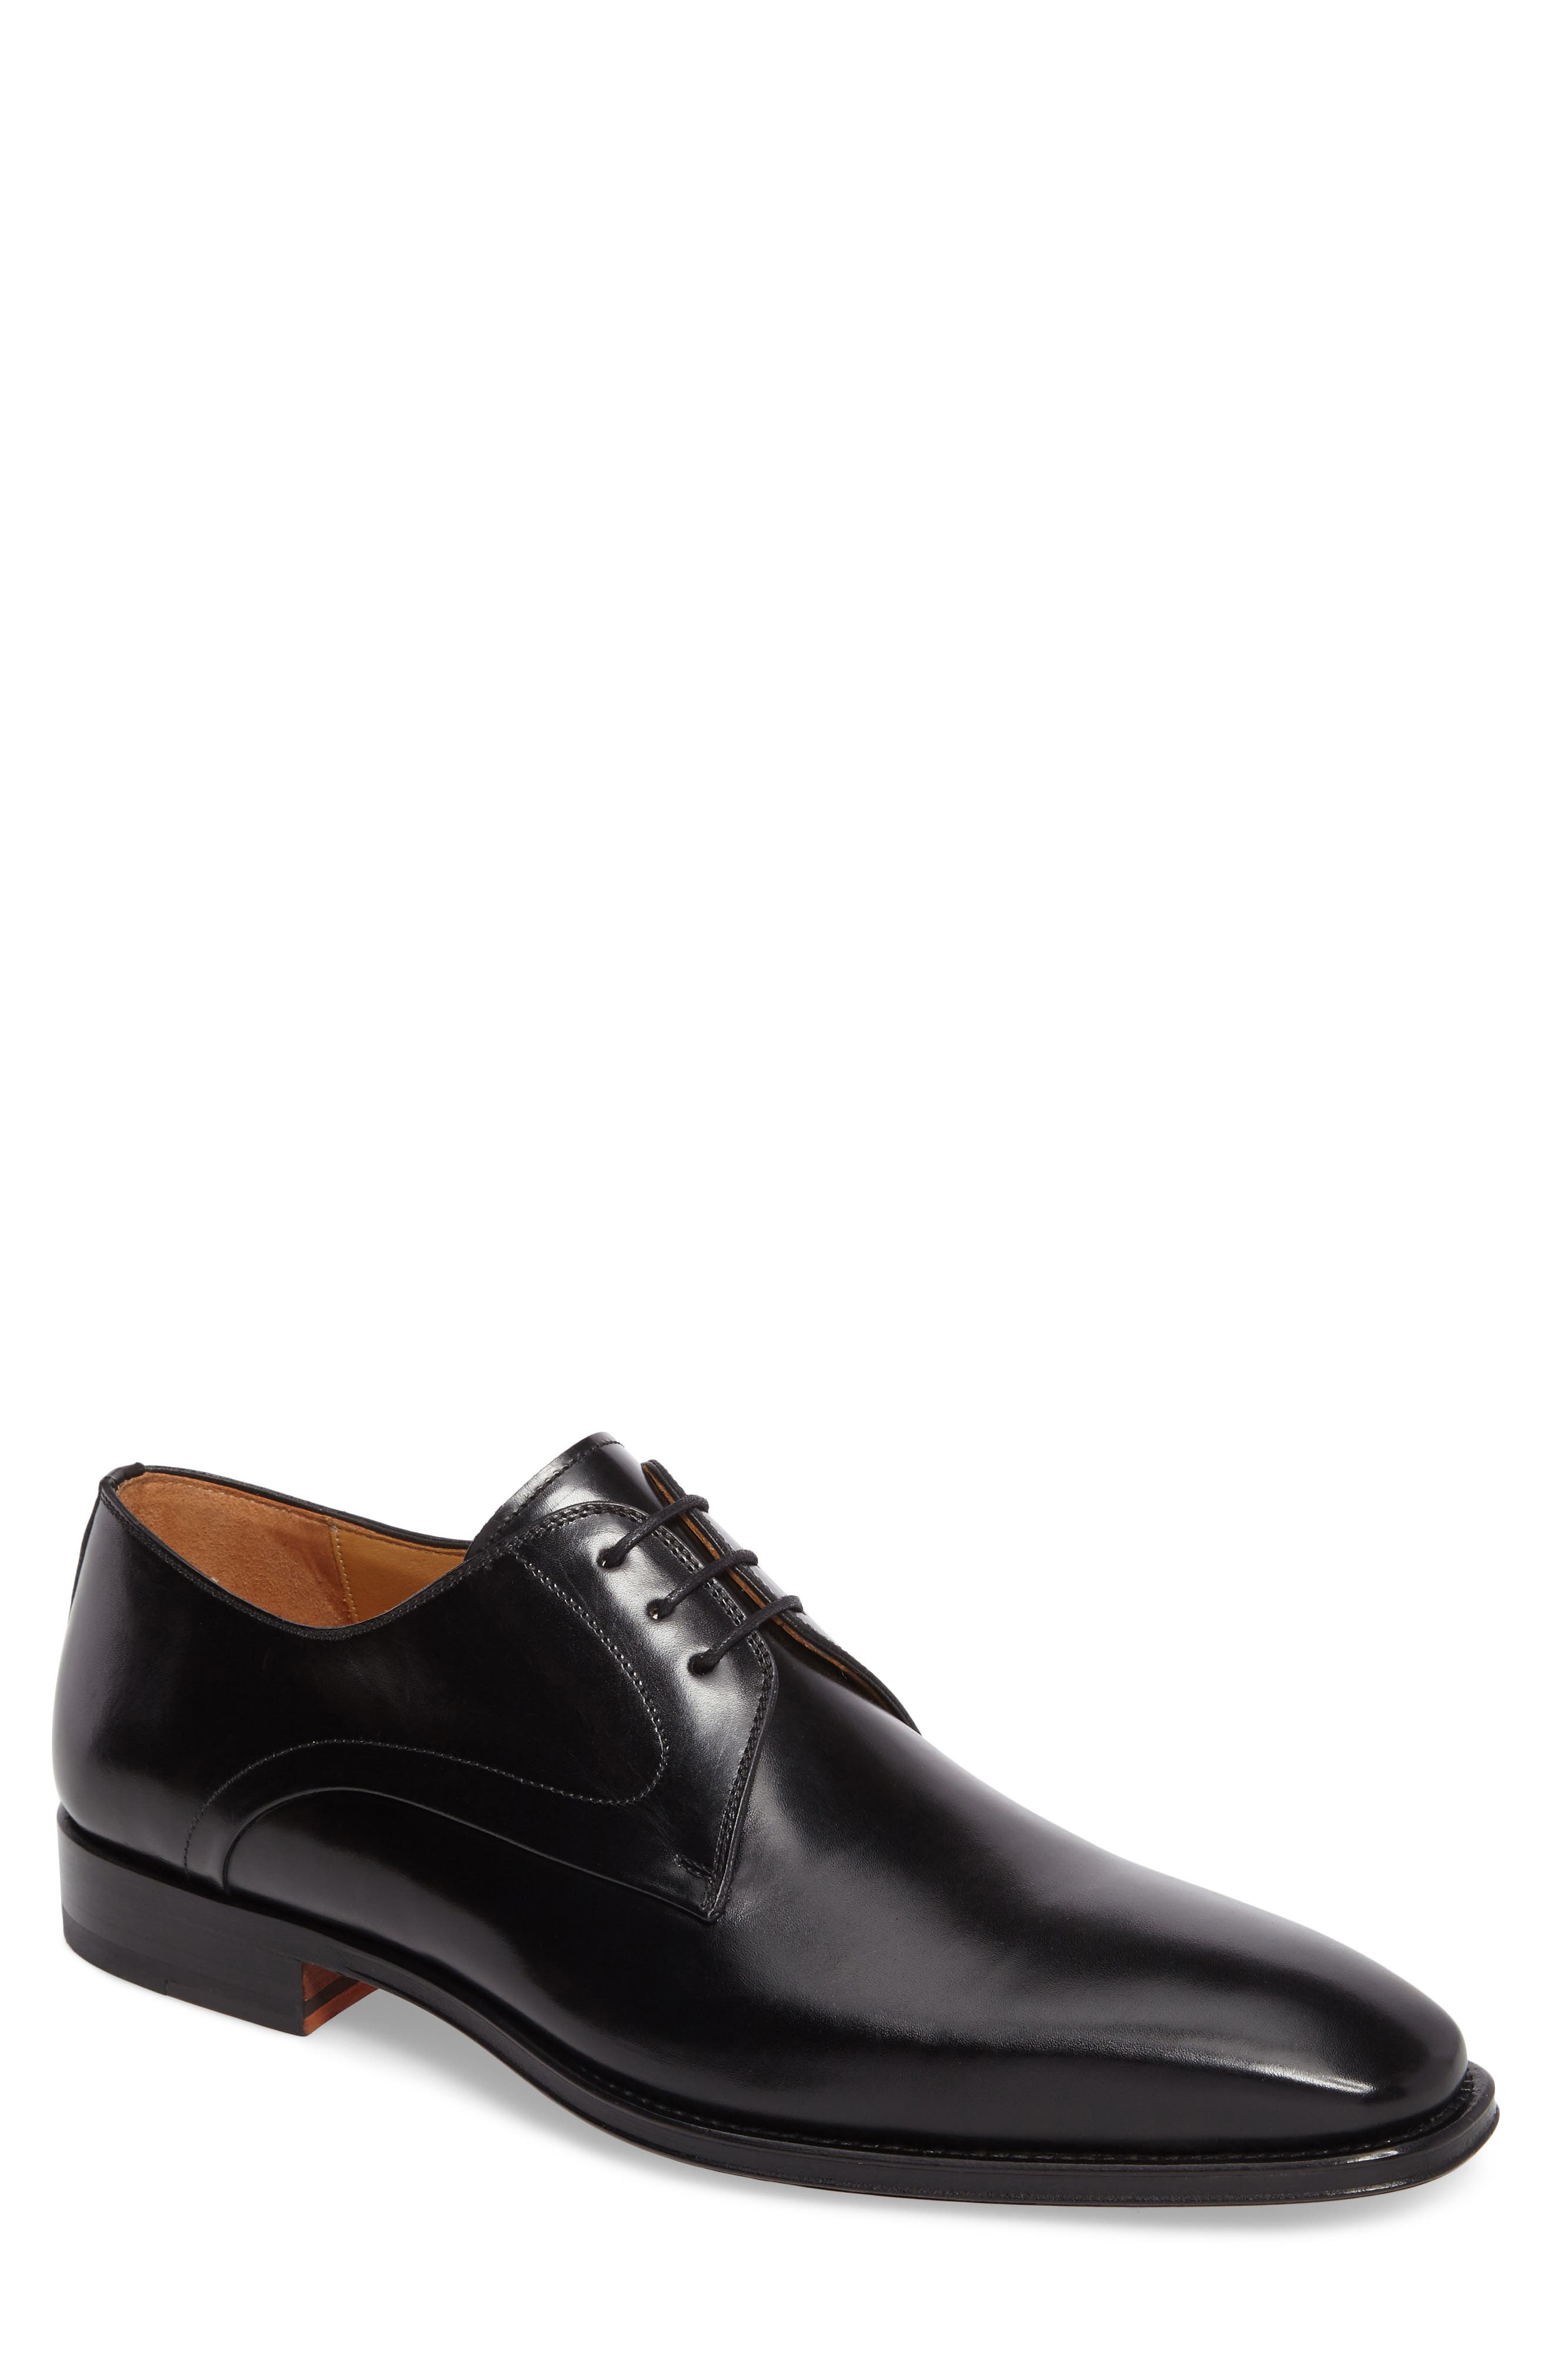 Mario Plain Toe Derby,                         Main,                         color, Black Leather